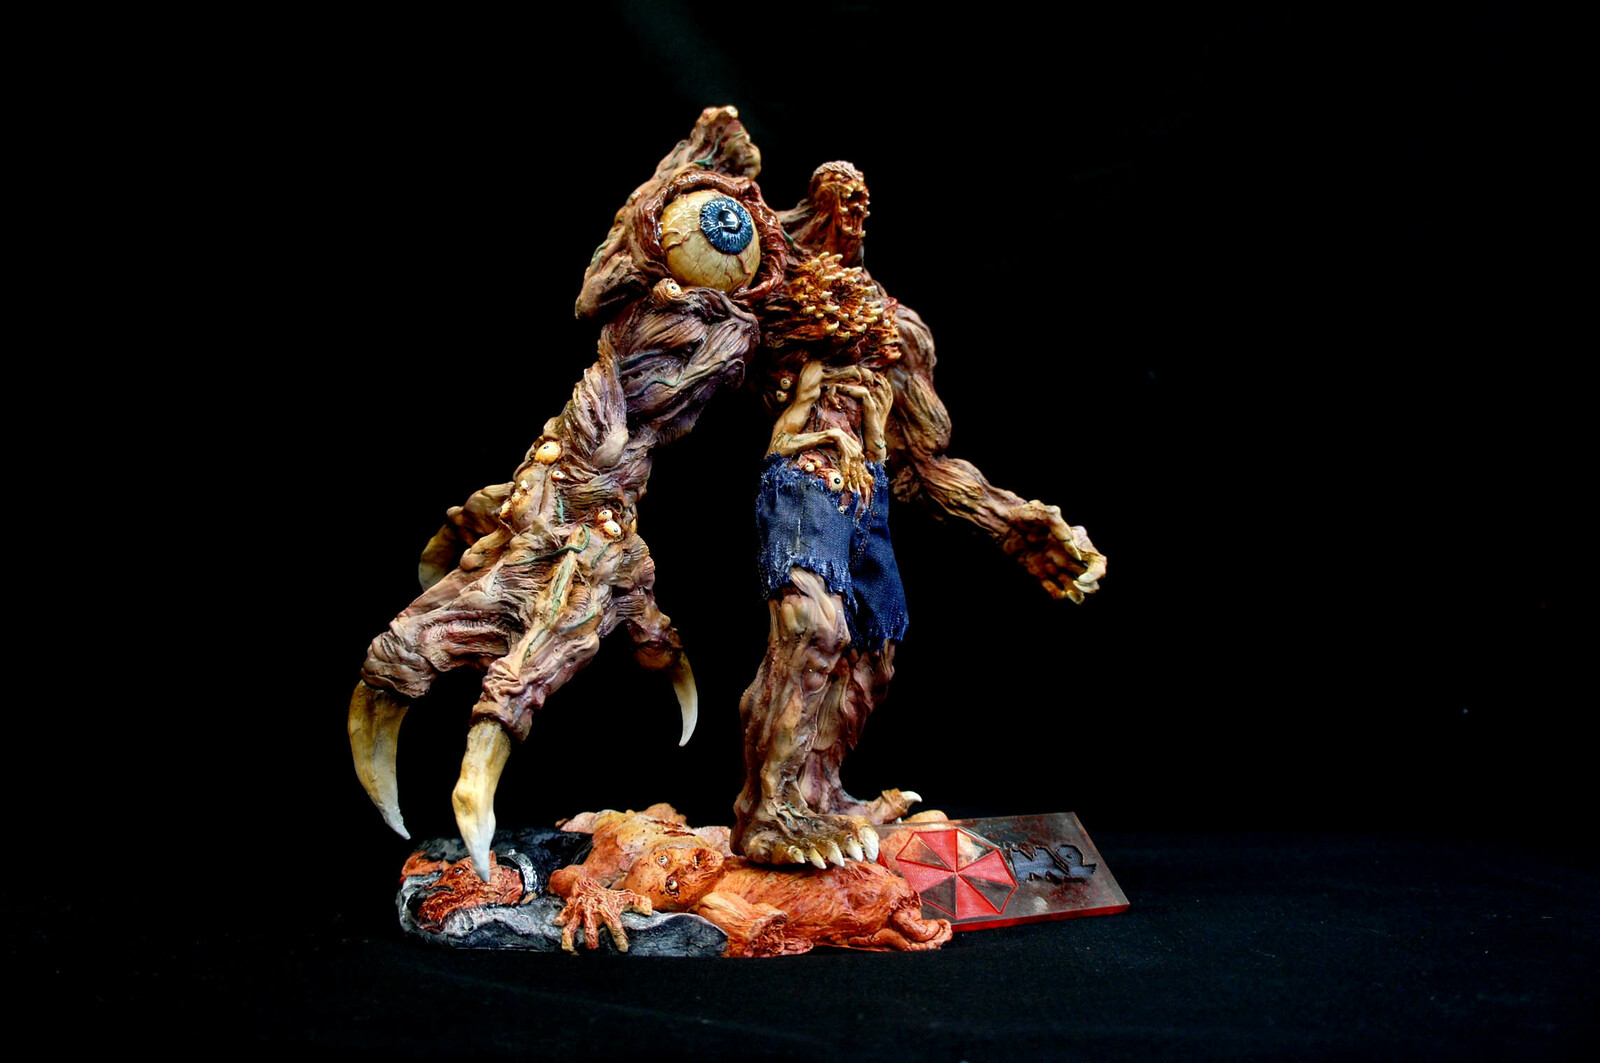 Dr. Birkin Mutation 2 Art Statue